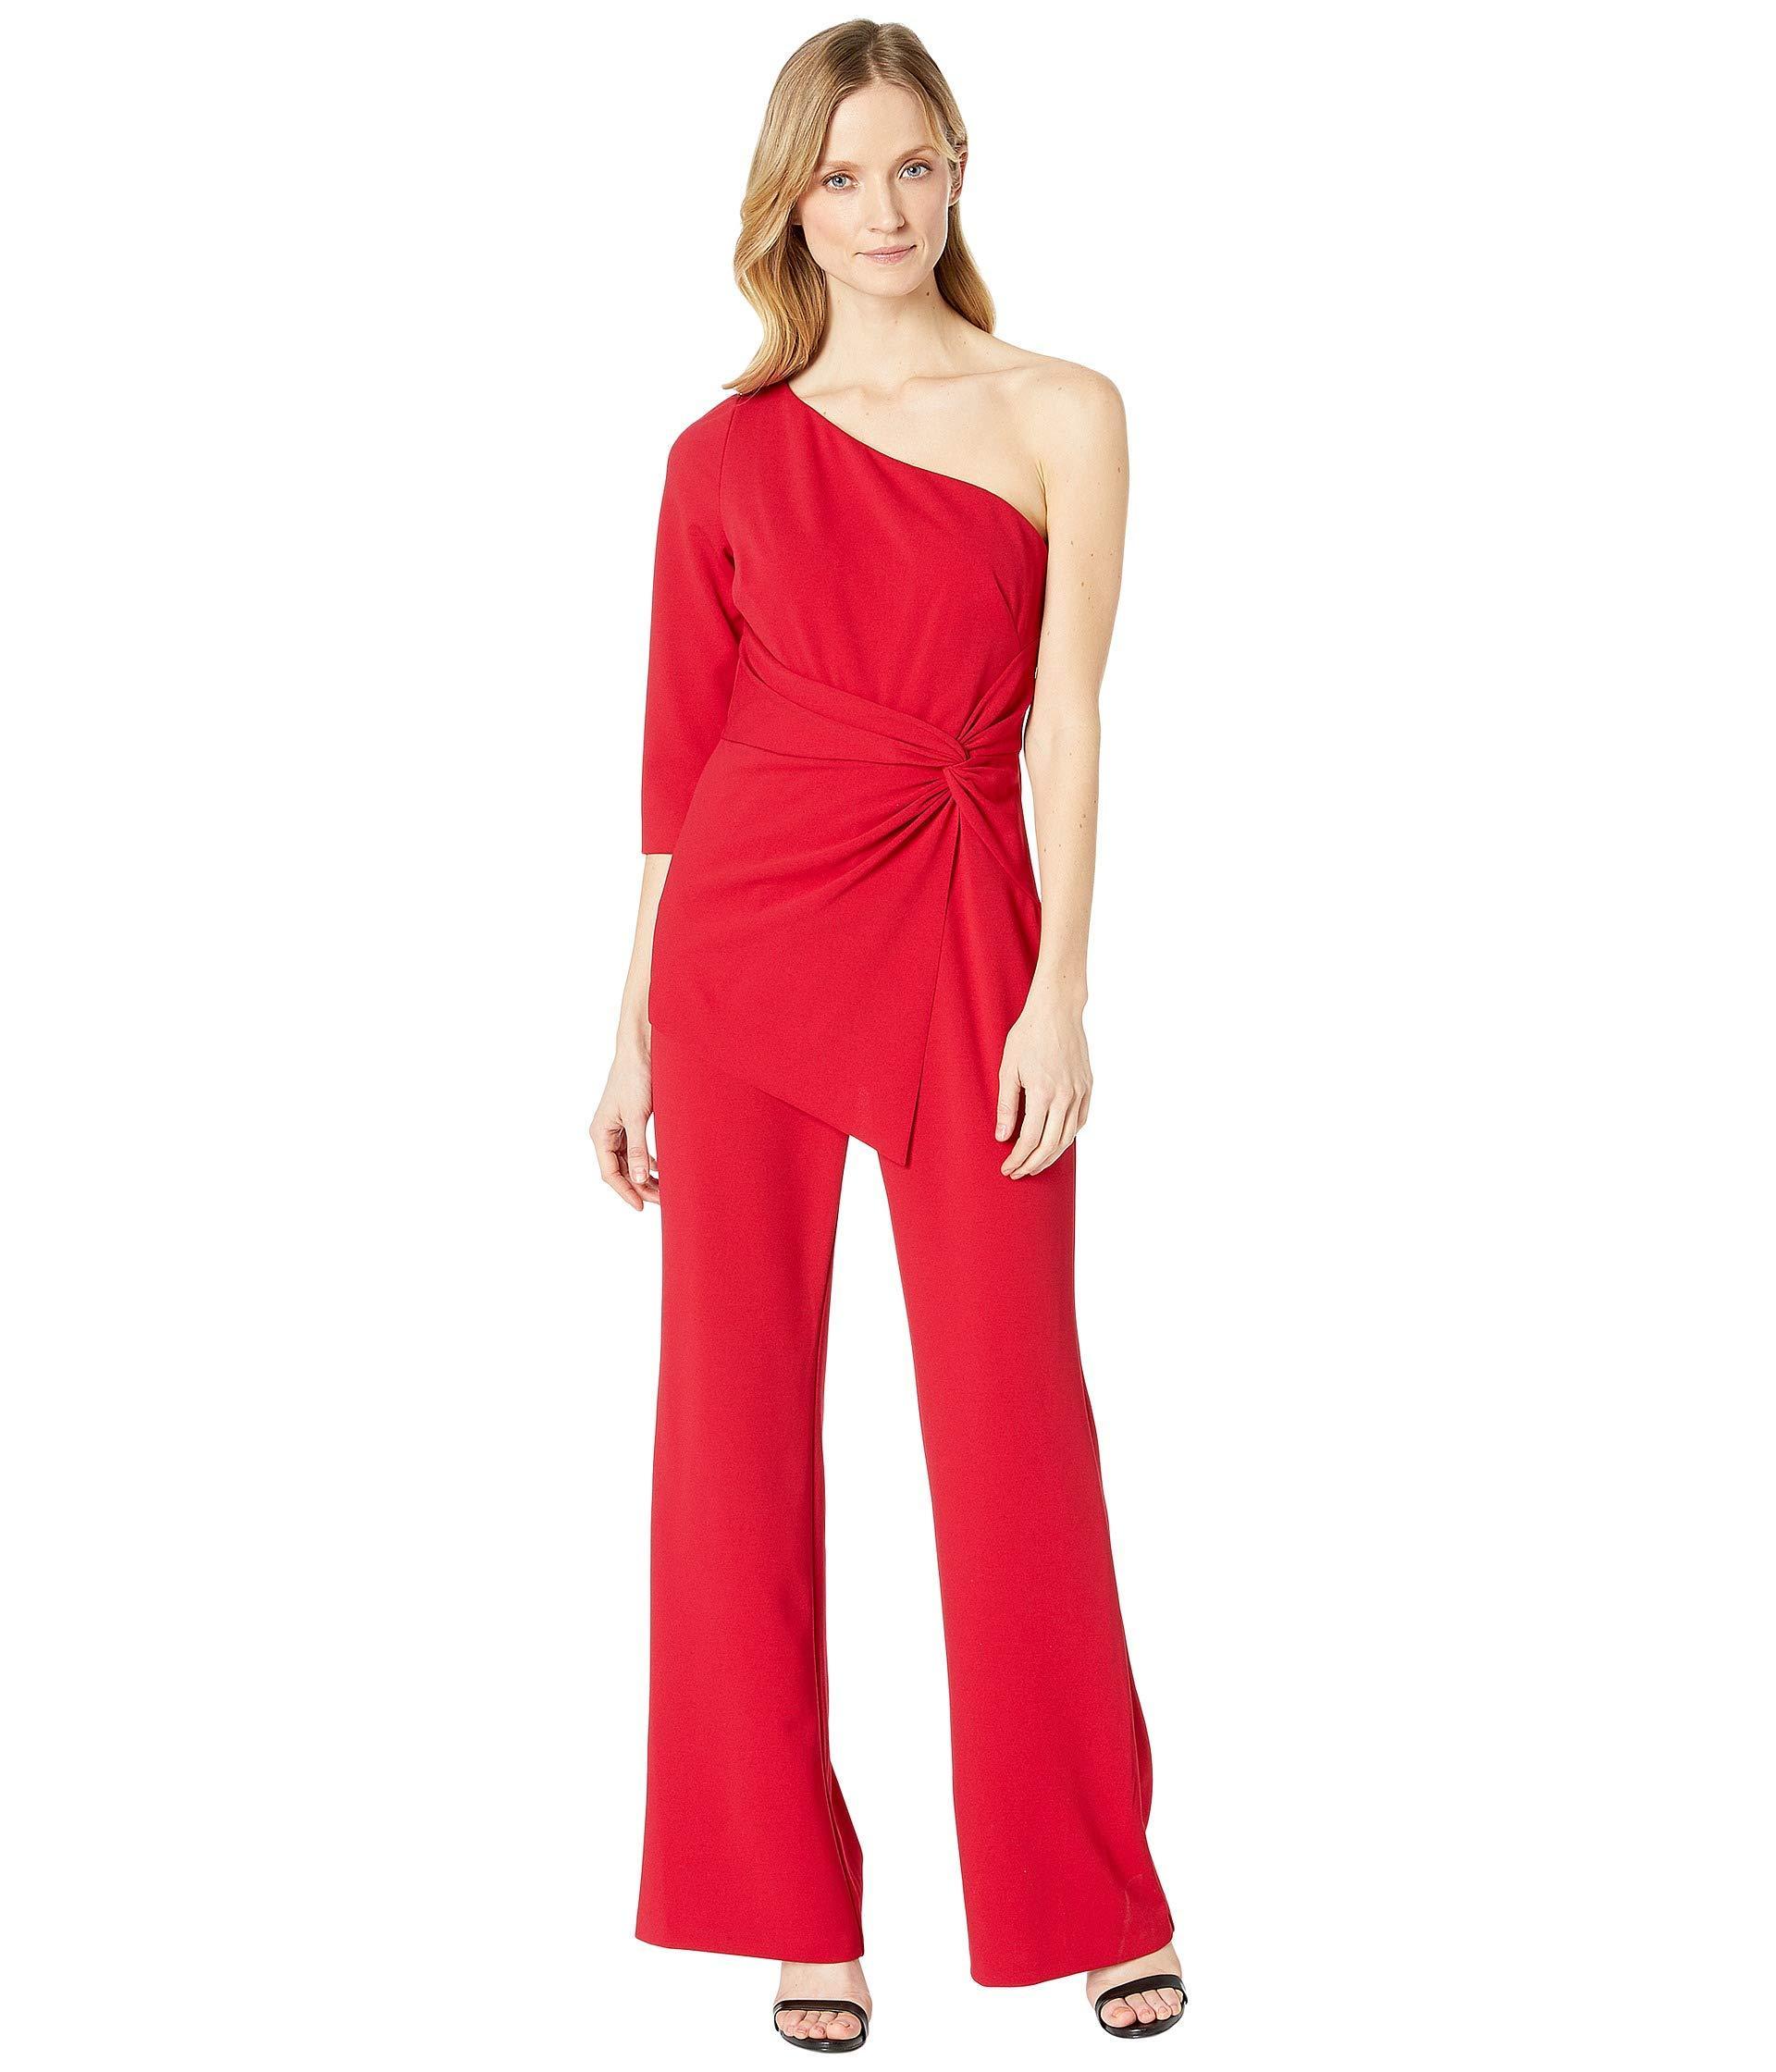 3cc3750b8d4e Lyst - Adrianna Papell One Shoulder Jumpsuit (dark Cherry) Women s ...